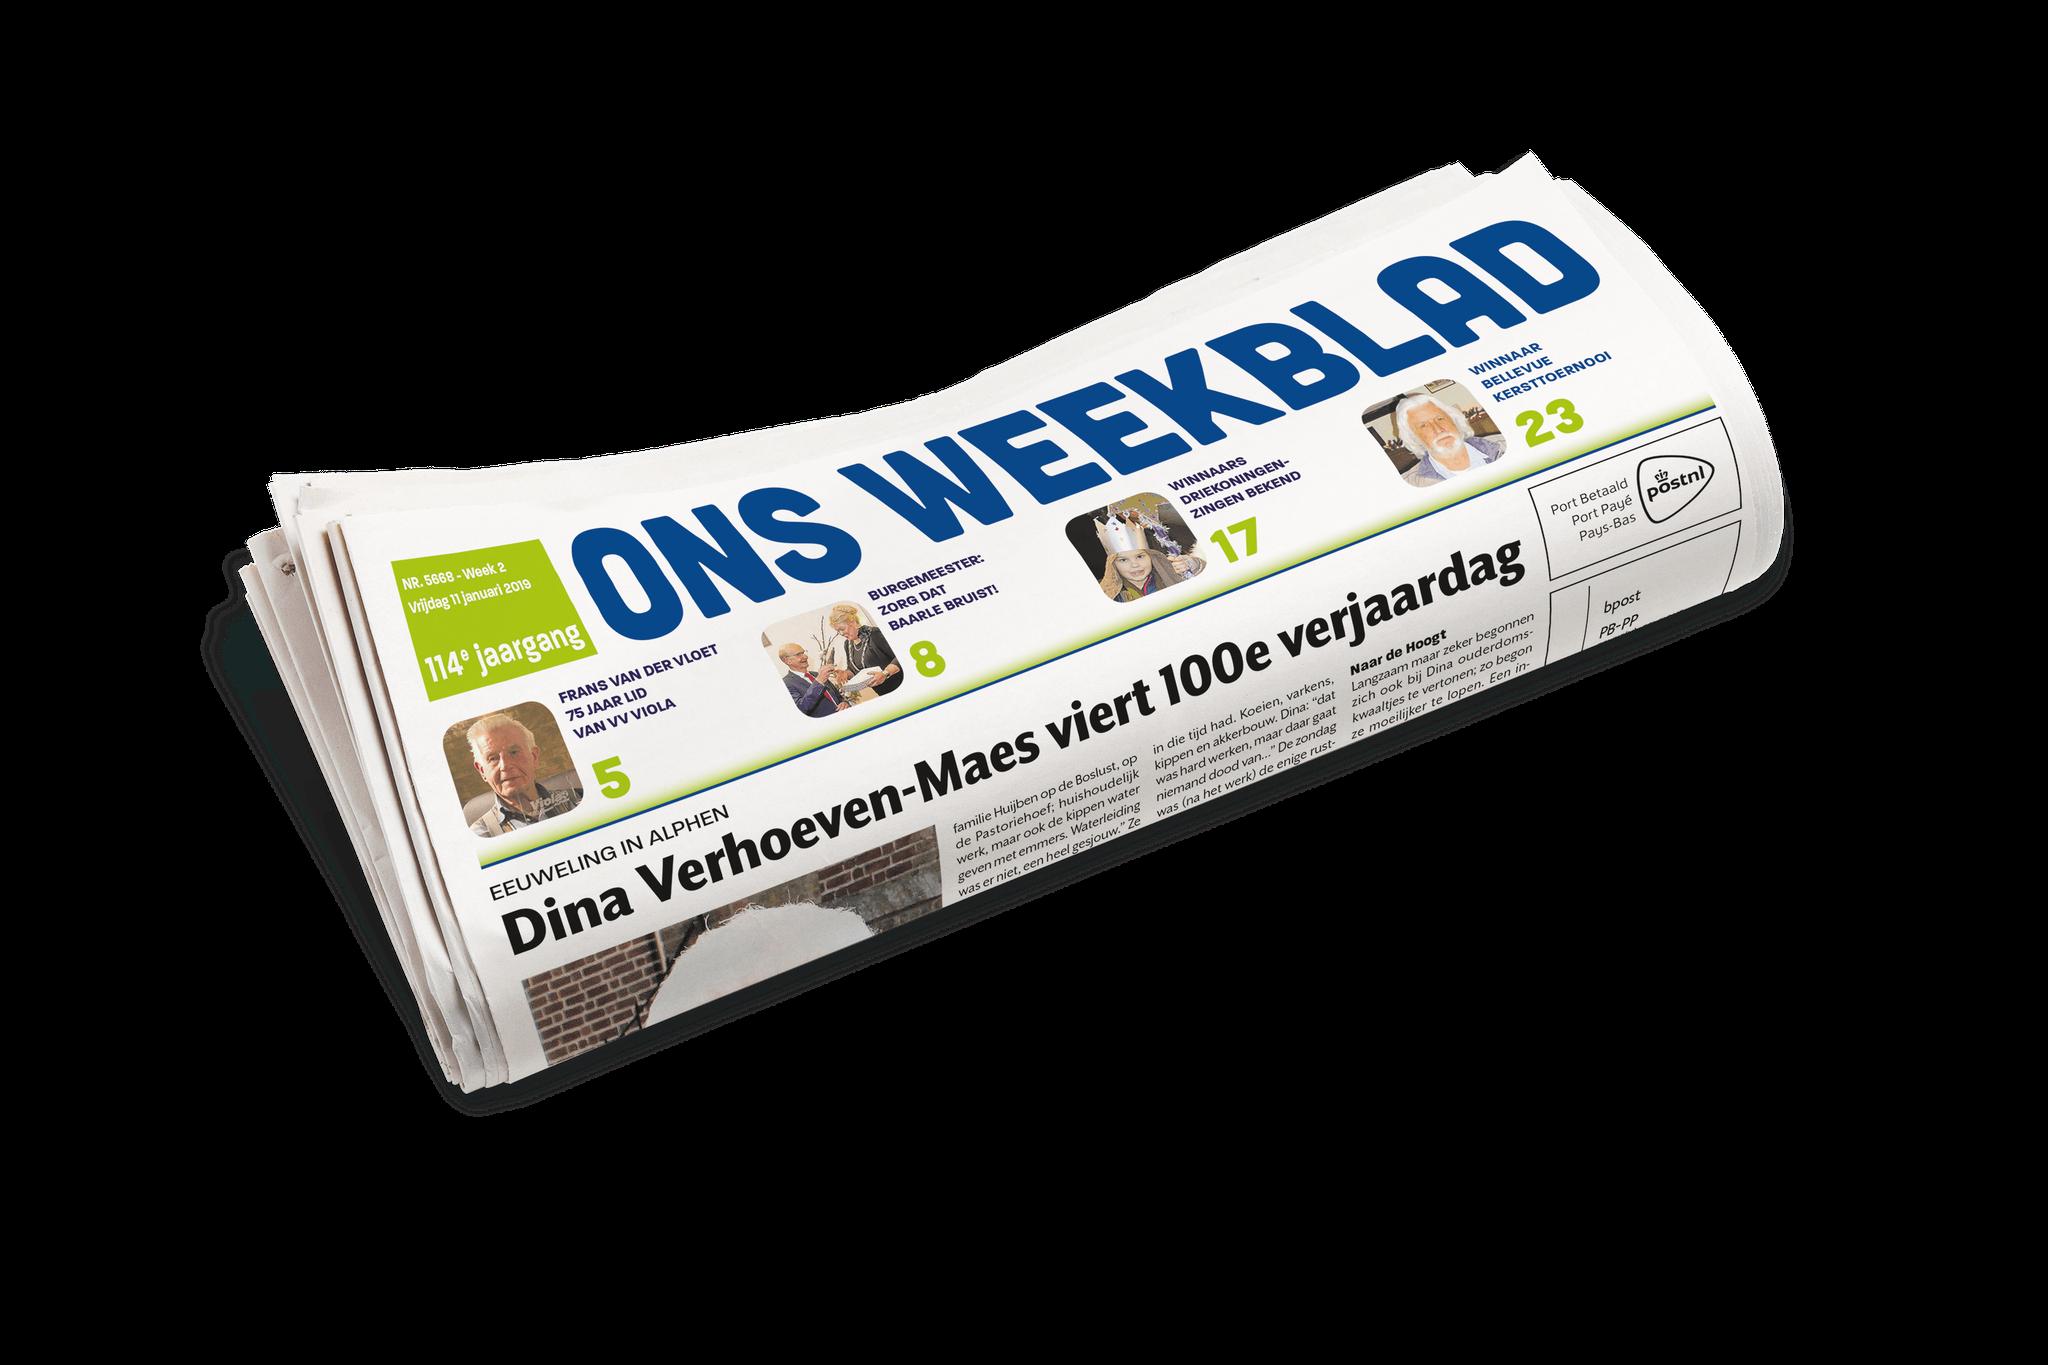 Ons Weekblad